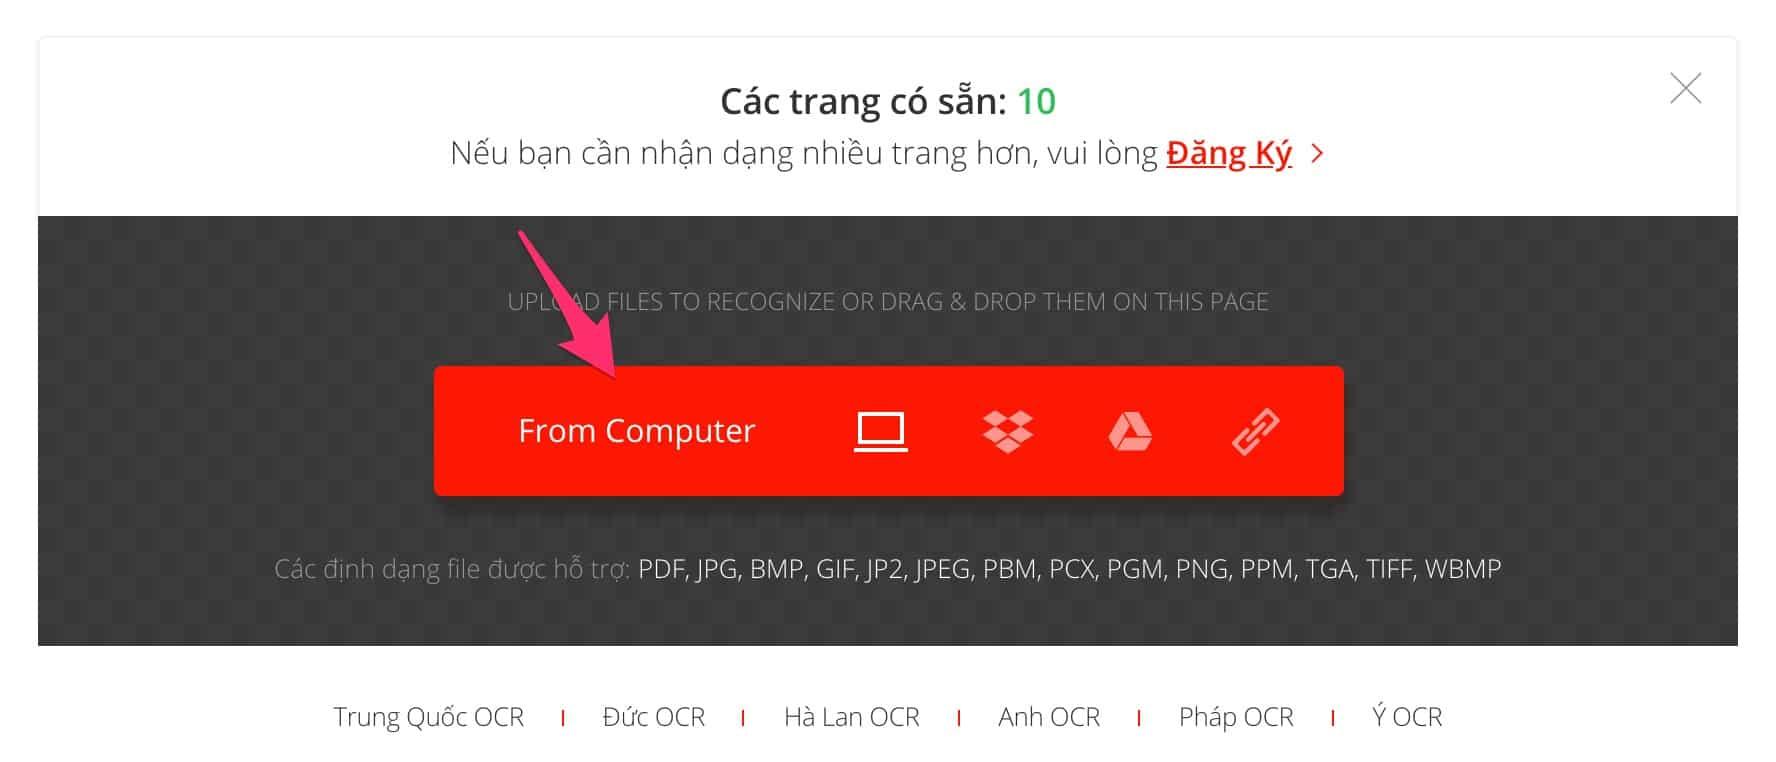 chuyen doi pdf hinh anh sang word